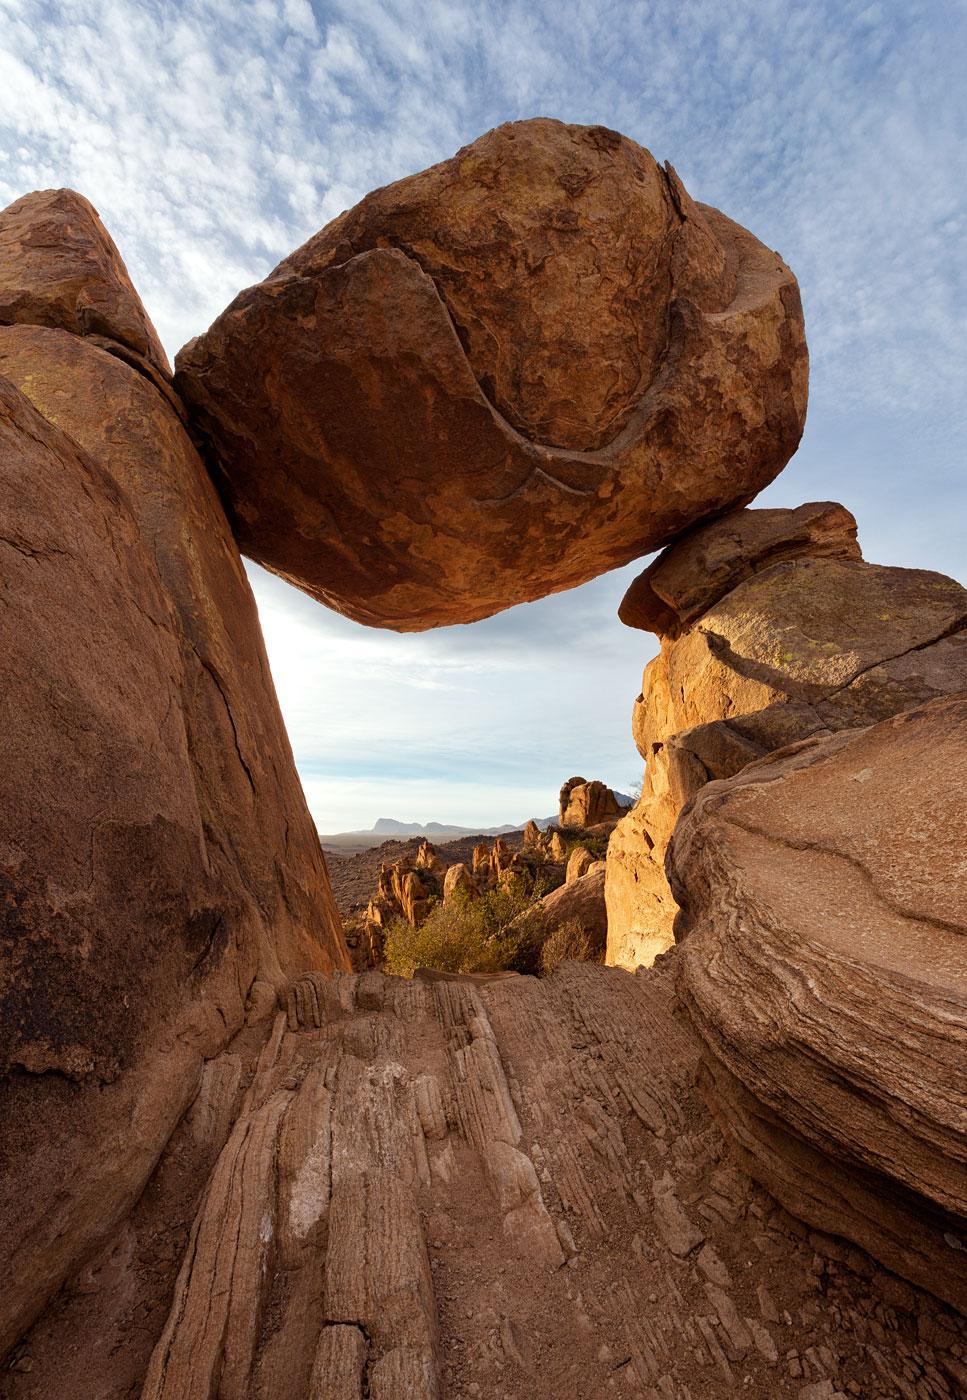 Big-Bend-National-Park-ABP-Balanced-Rock_vert.jpg